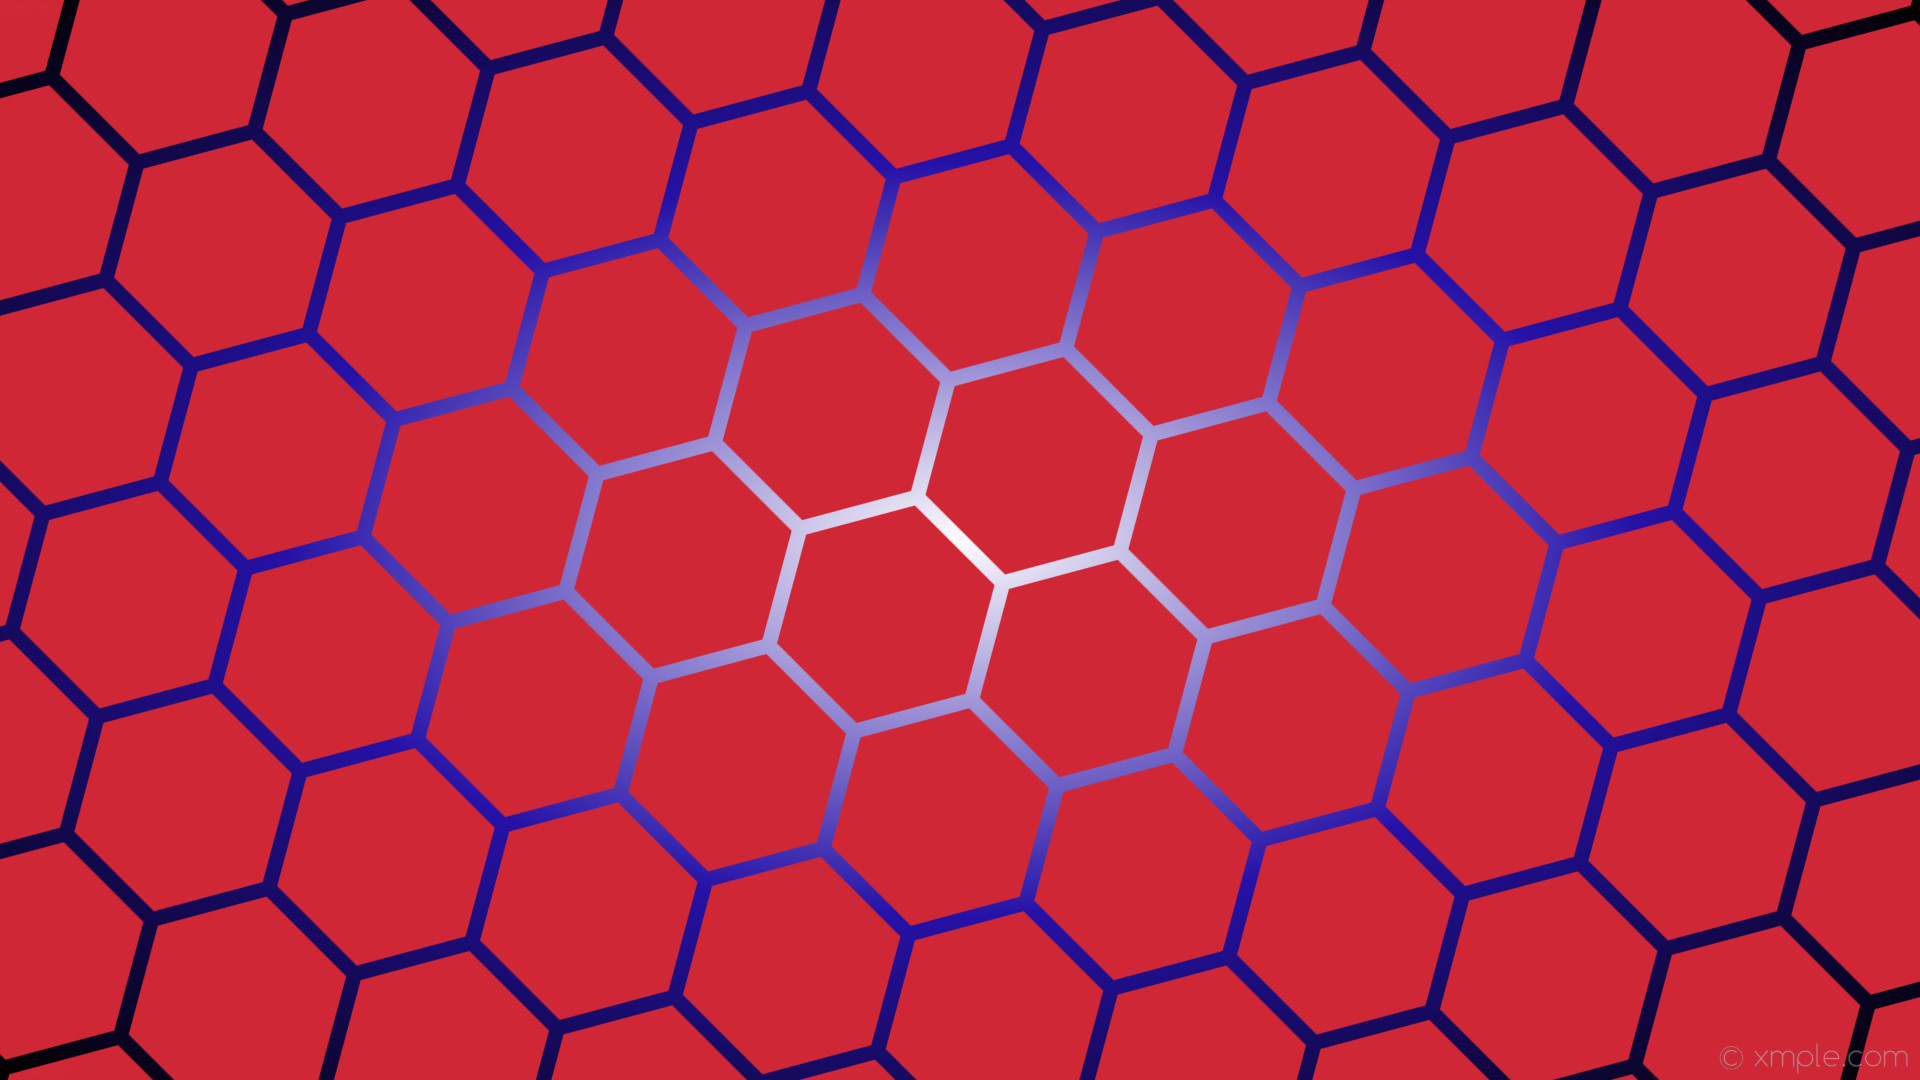 wallpaper gradient hexagon black red white blue glow #d02737 #ffffff  #2311a8 diagonal 45